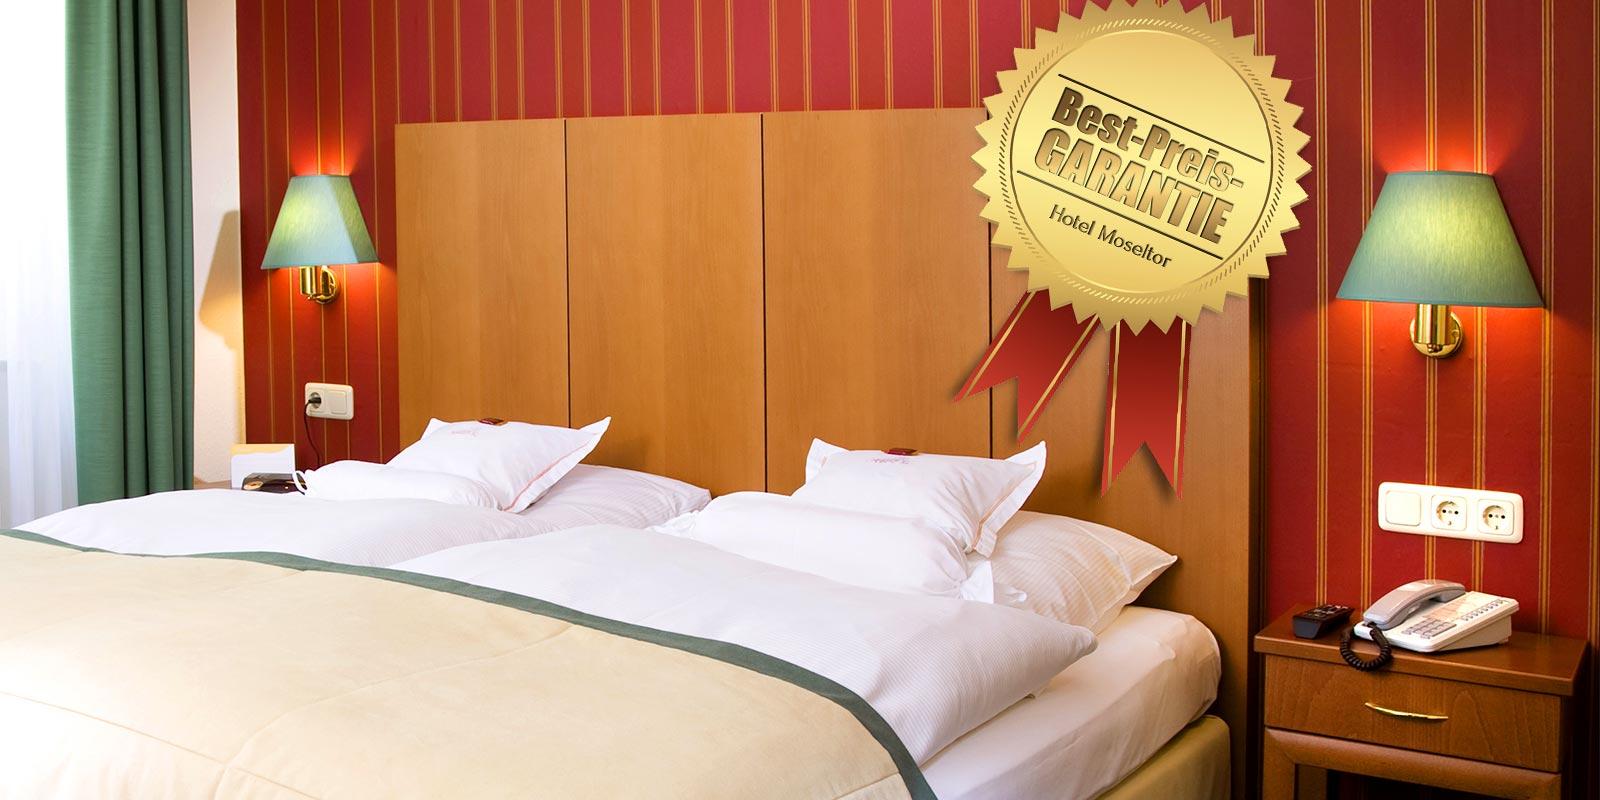 Hotel-Preise